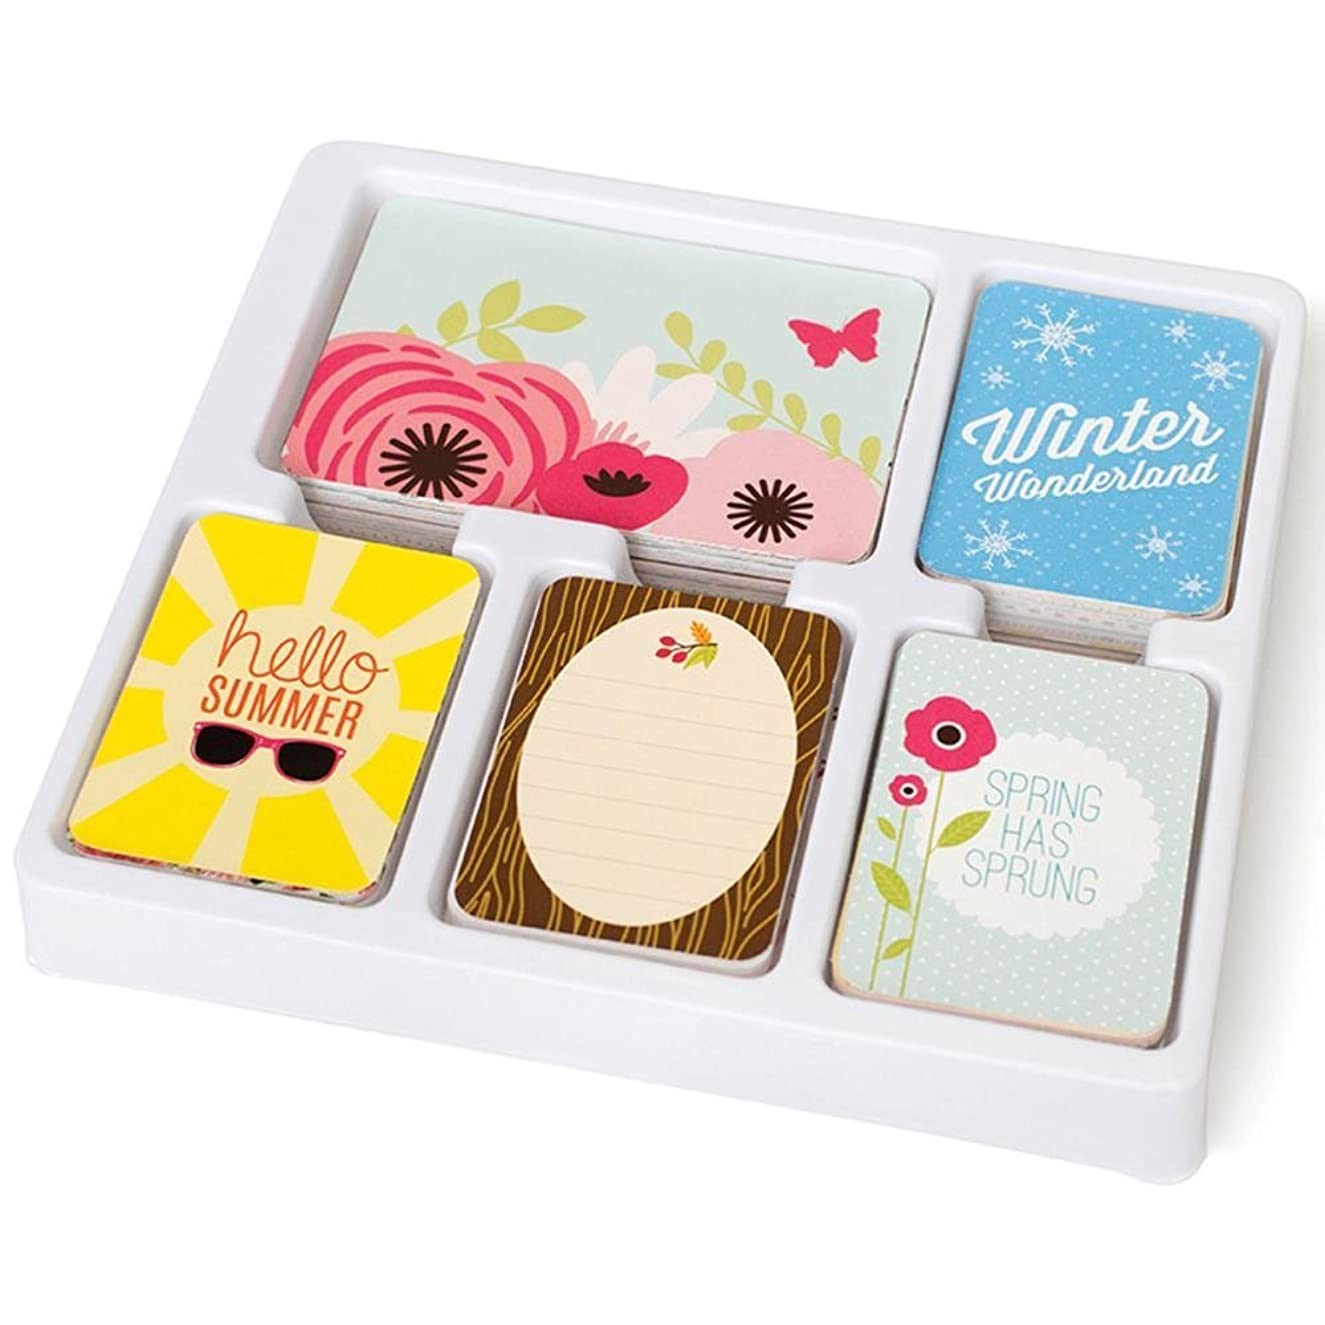 Project Life Core Kit - Seasons Edition